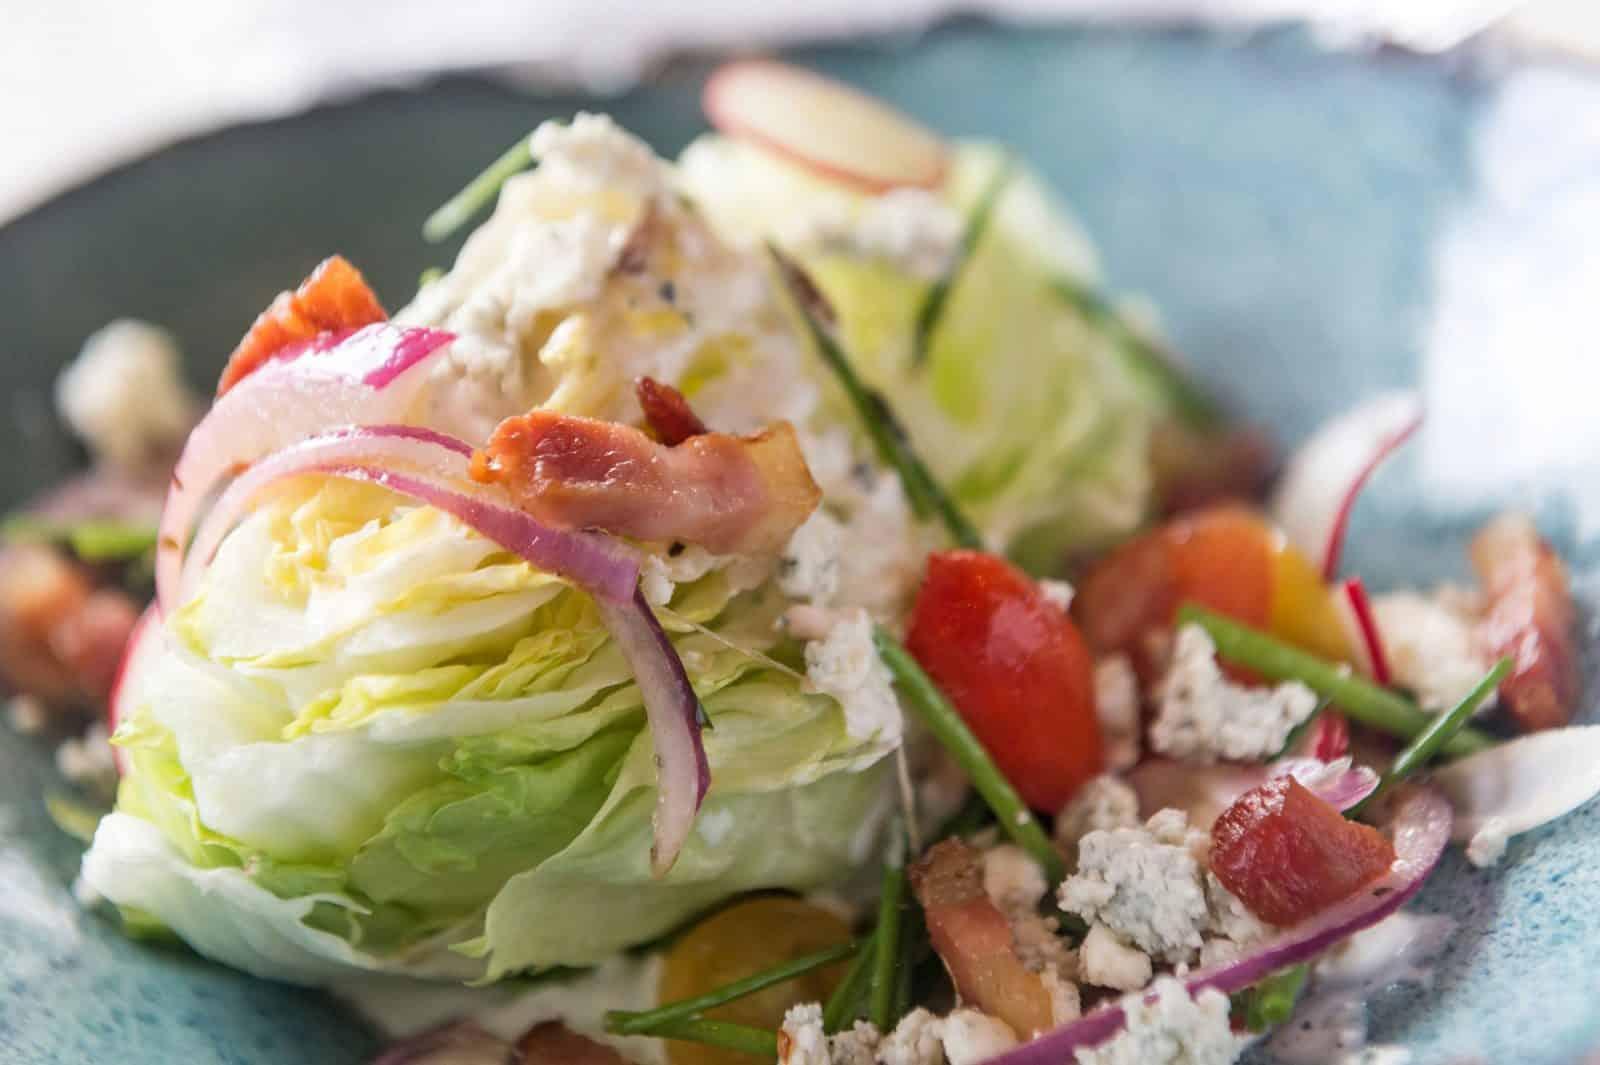 9 Foods You Should NEVER Order at a Restaurant